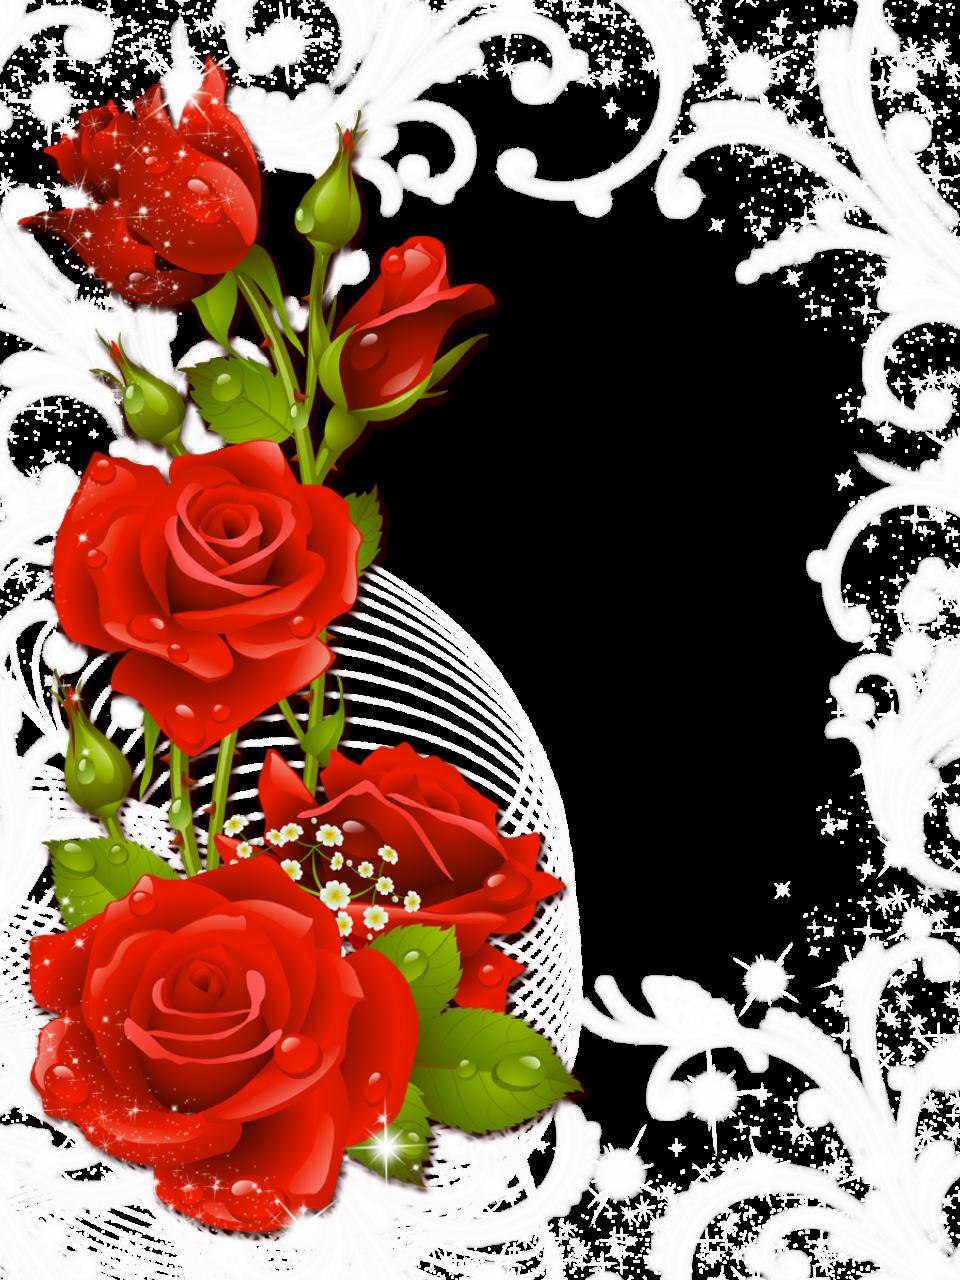 http://img-fotki.yandex.ru/get/5640/41771327.358/0_87afb_c7866dab_orig.png